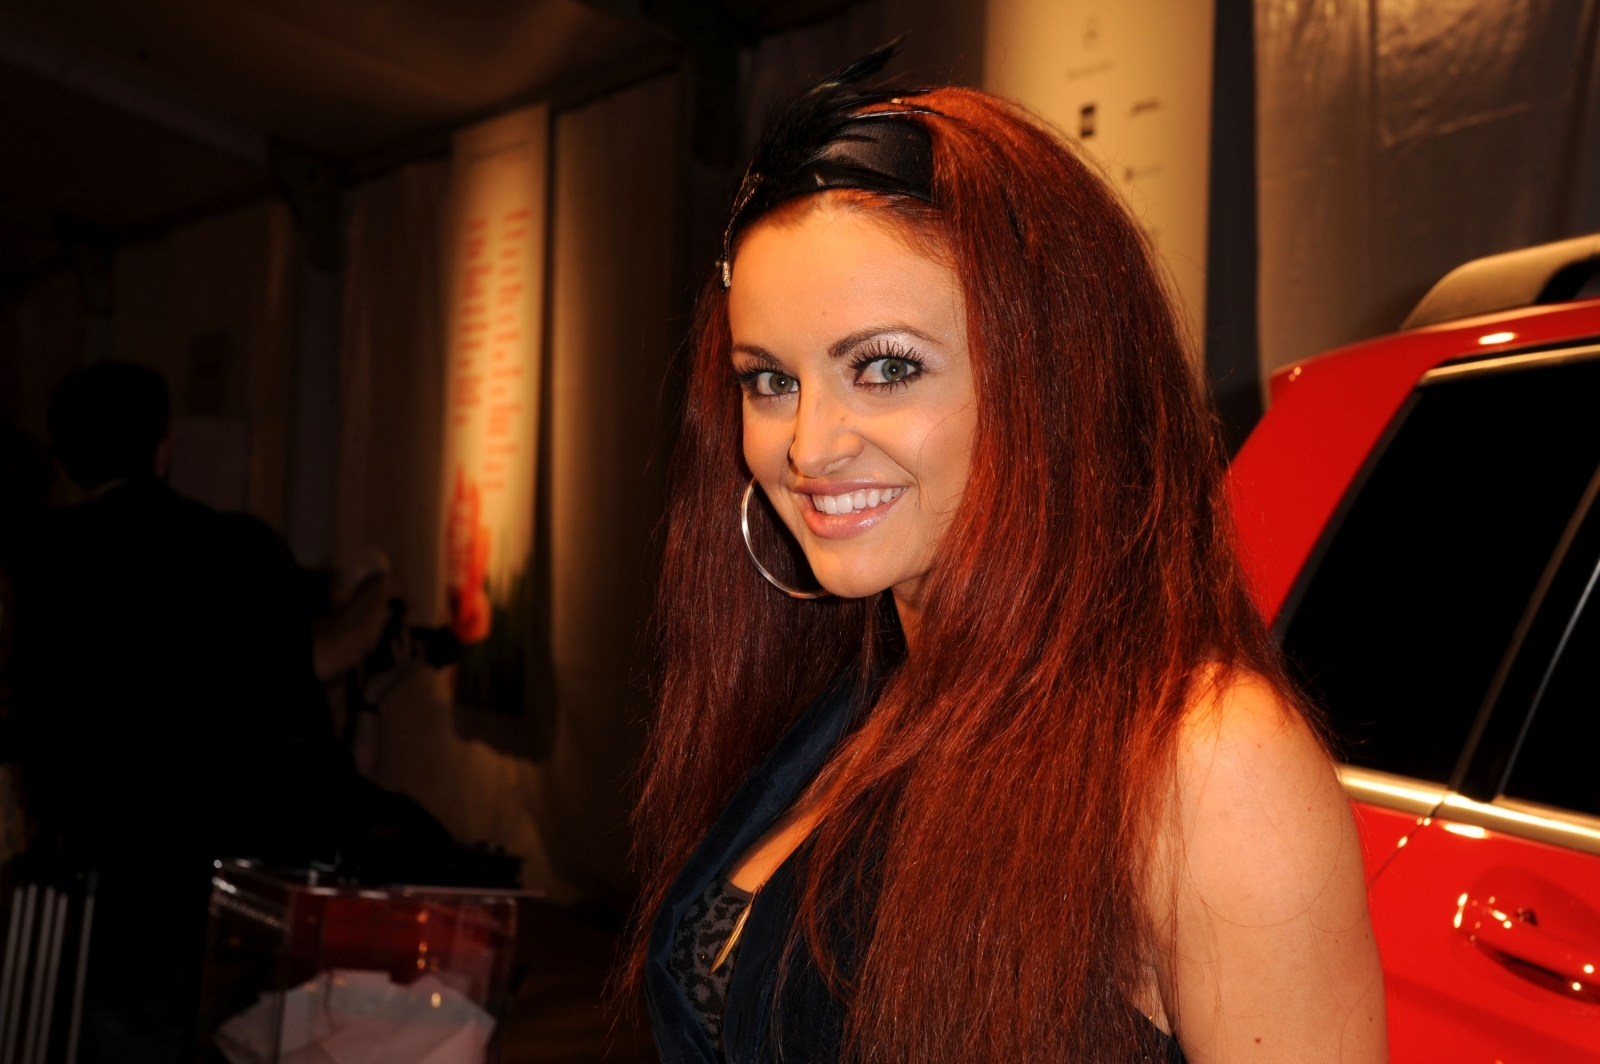 Wwe Star Maria Nude 3